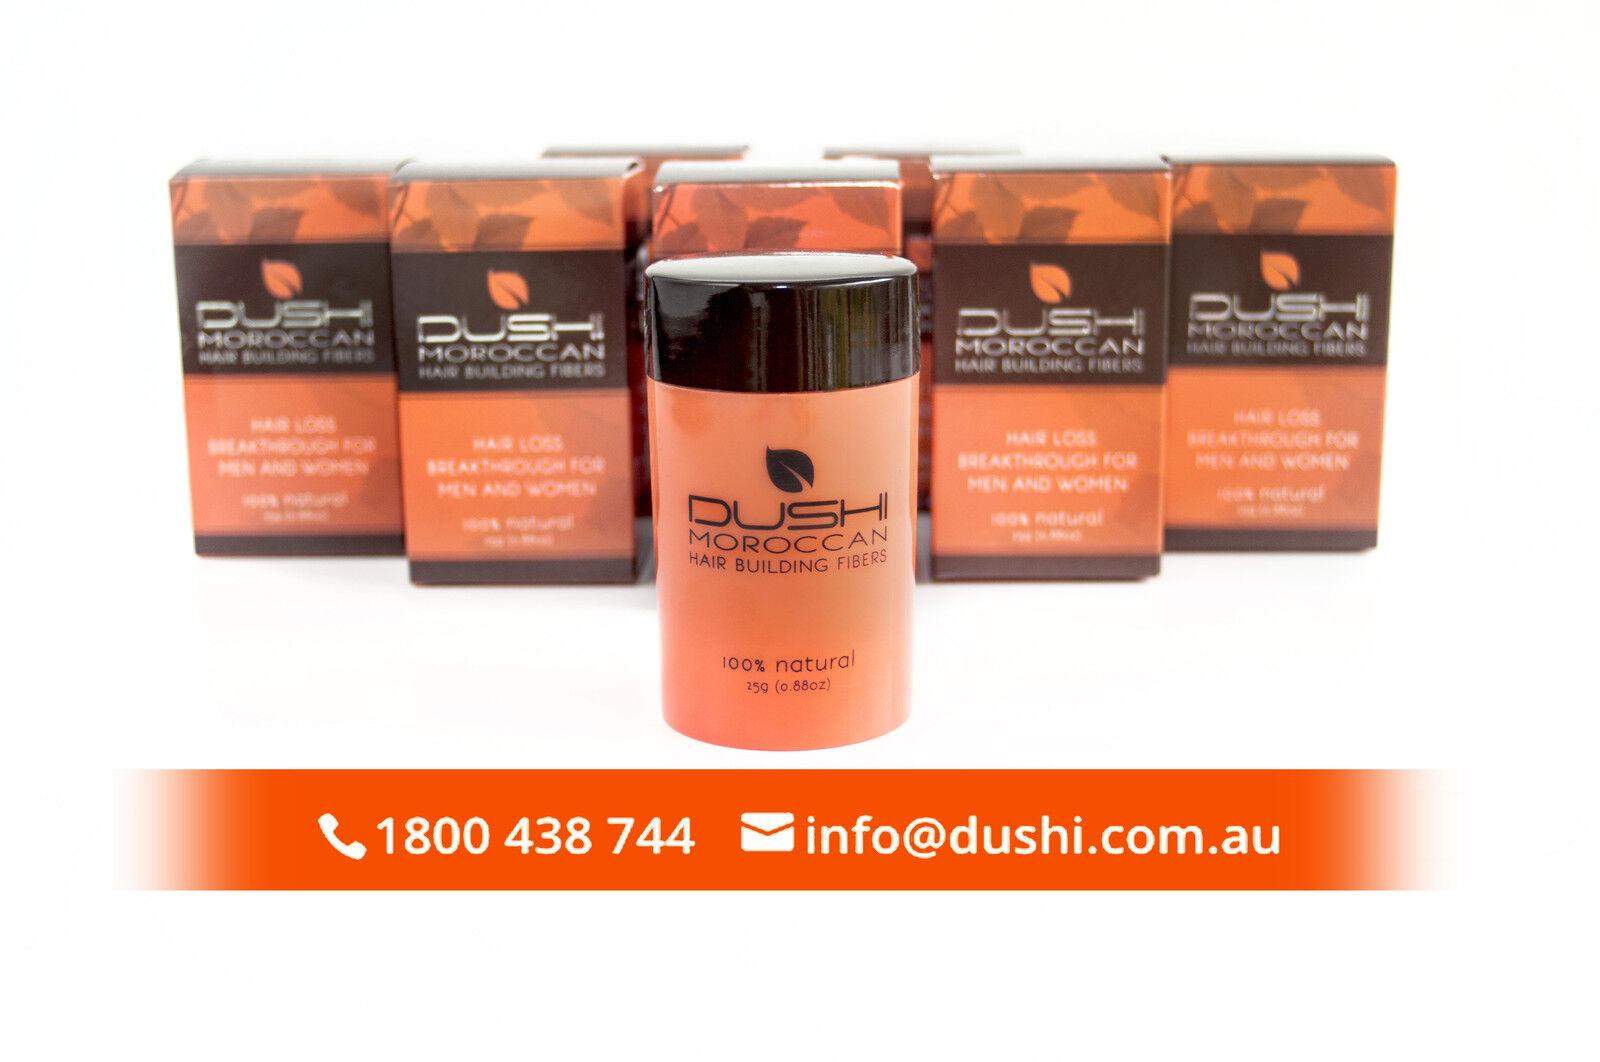 Dushi Australia